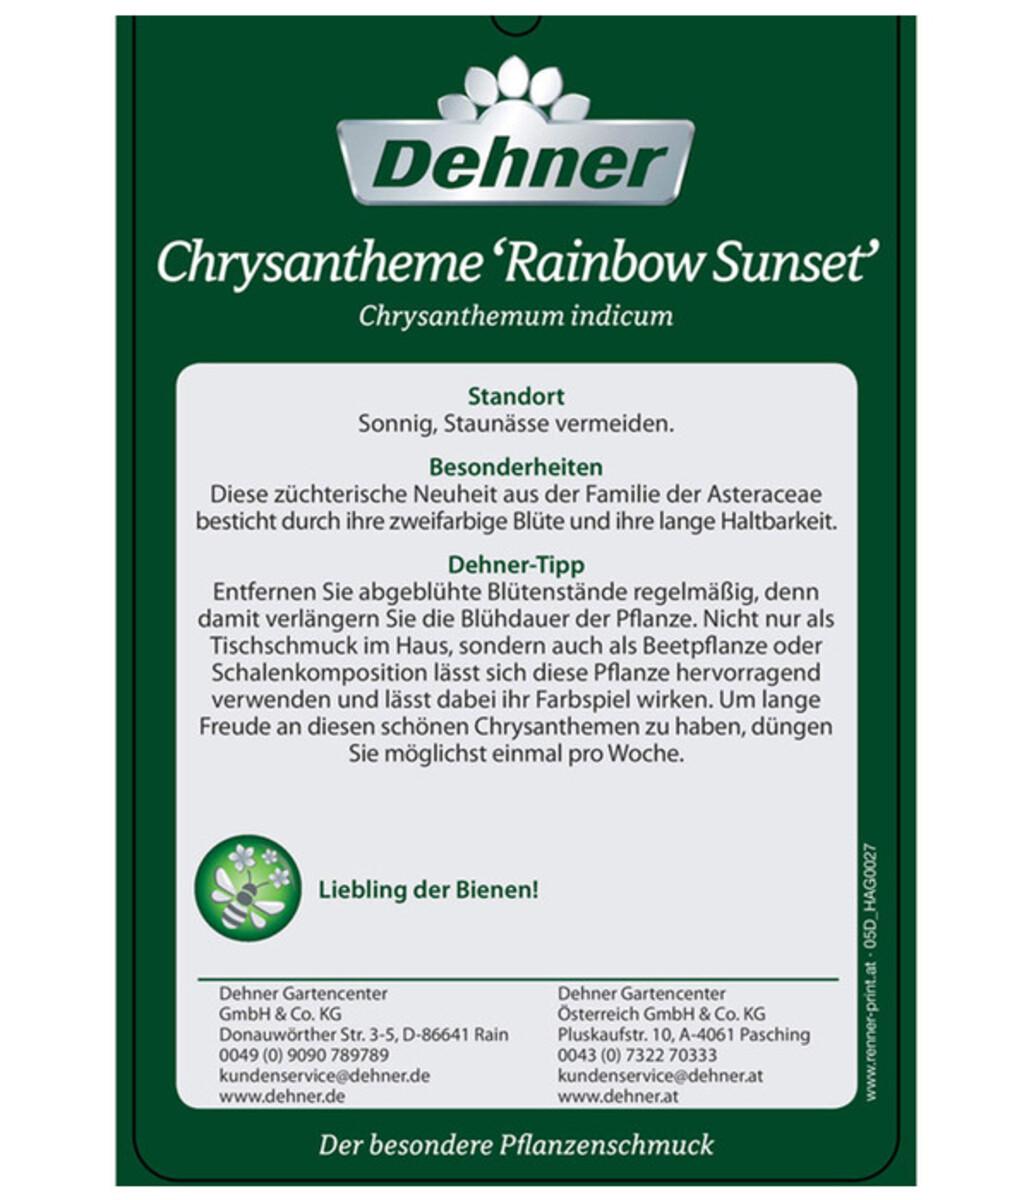 Bild 5 von Chrysantheme 'Rainbow Sunset'